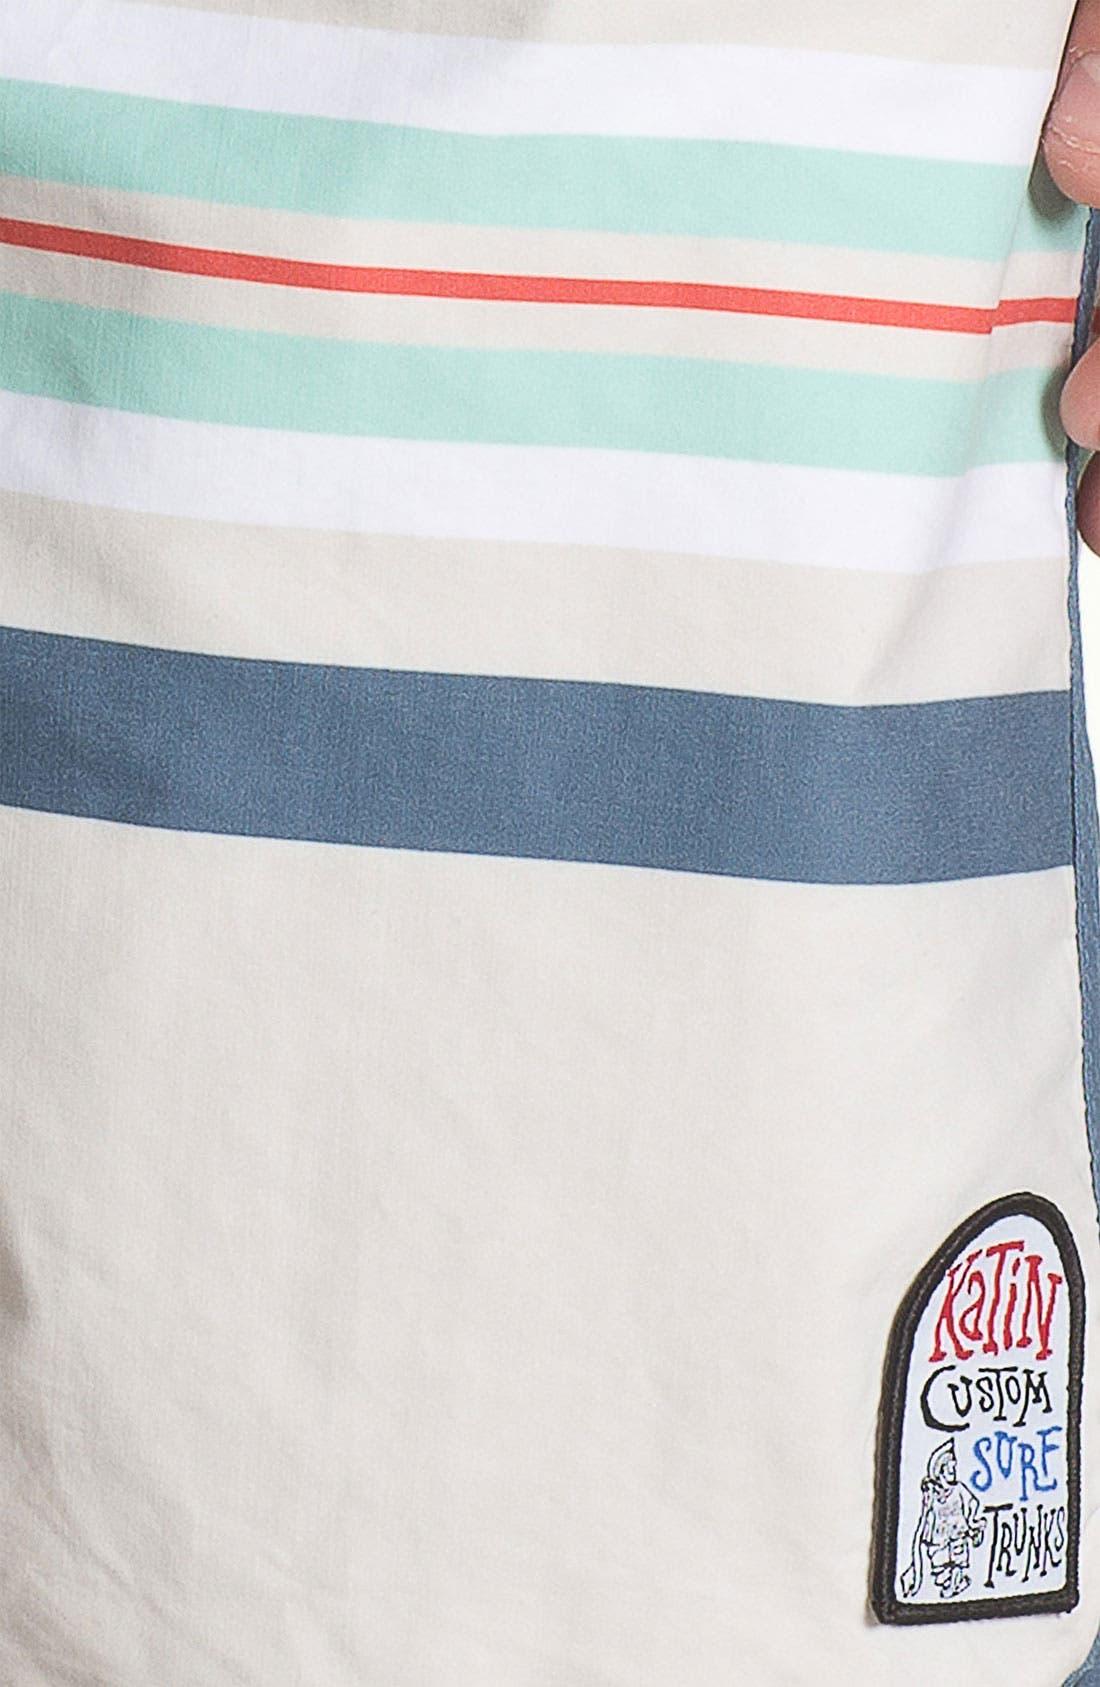 Alternate Image 3  - Katin 'South Pacific' Stripe Print Board Shorts